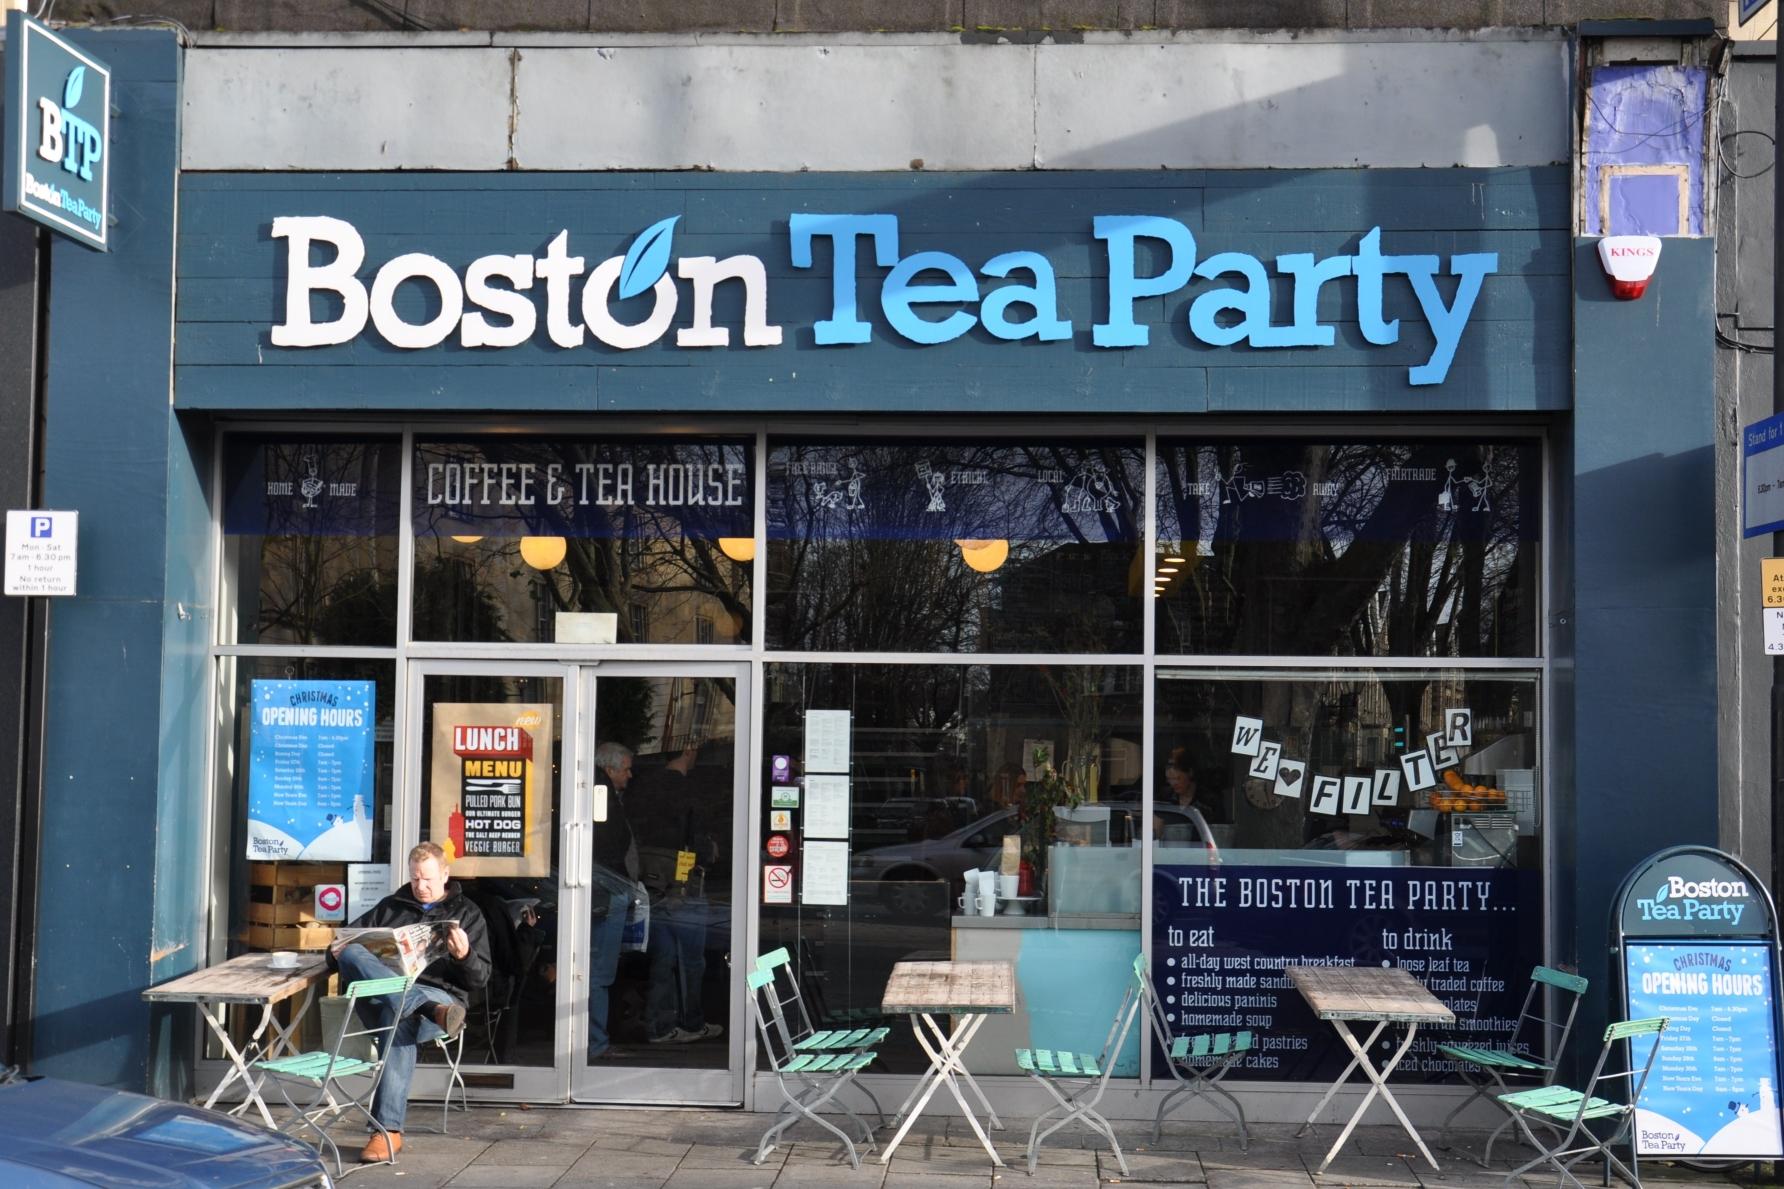 The exterior of Boston Tea Party branch on Whiteladies Road in Bristol